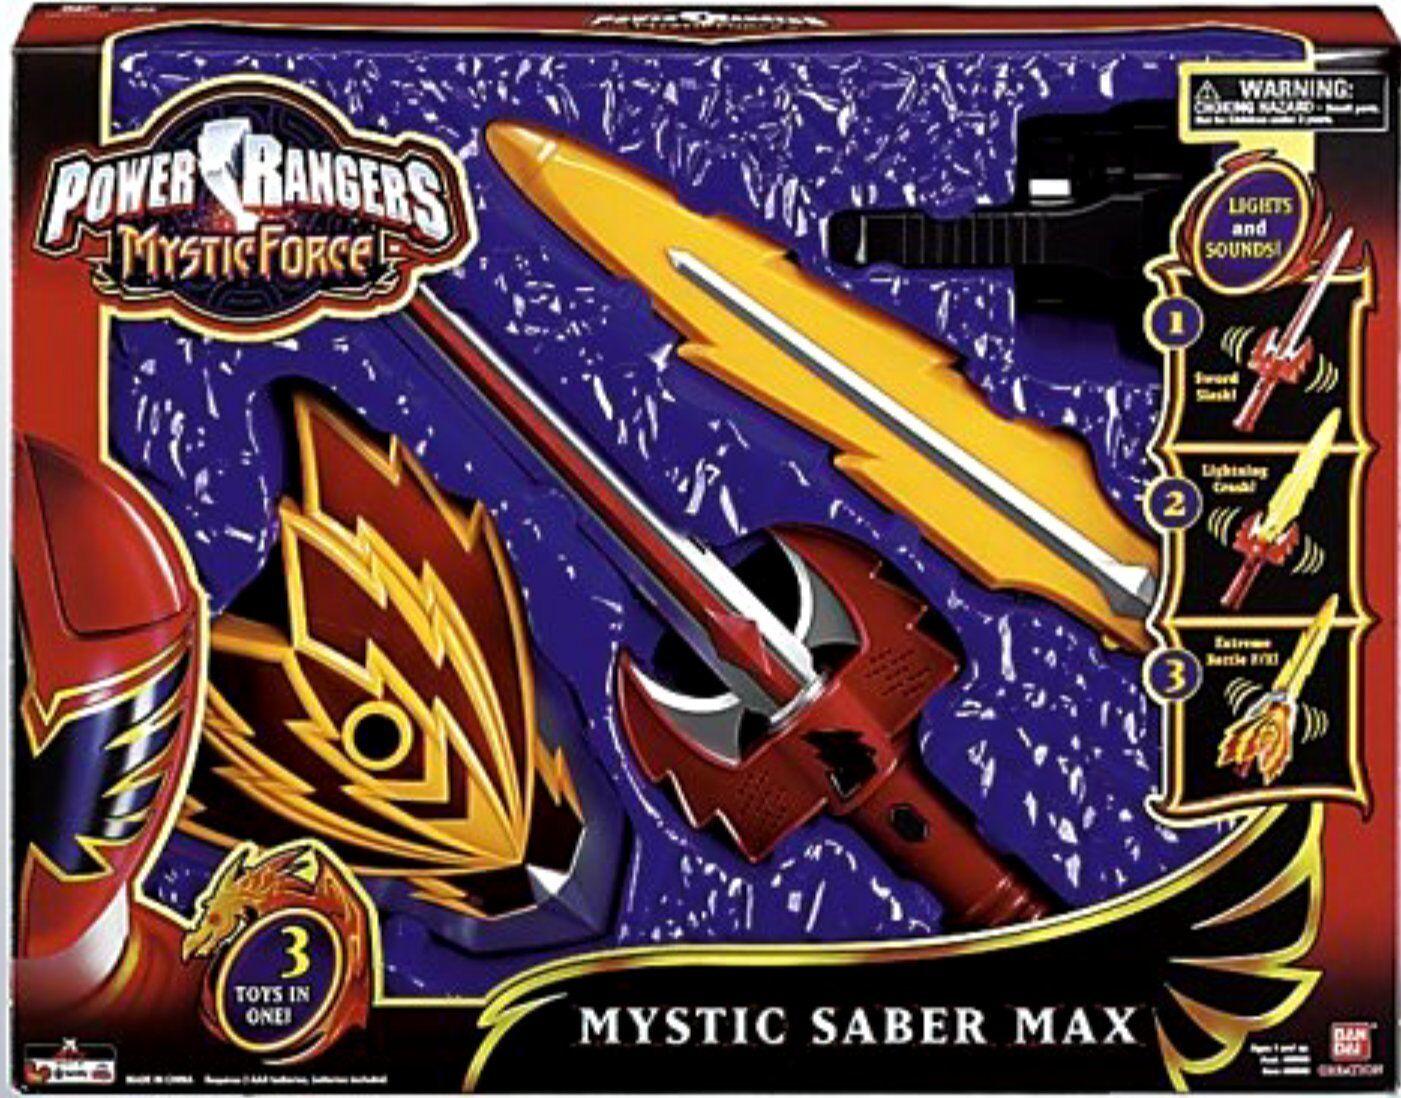 Power rangers mystische kraft mystic säbel max neue fabrik versiegelt, 2006